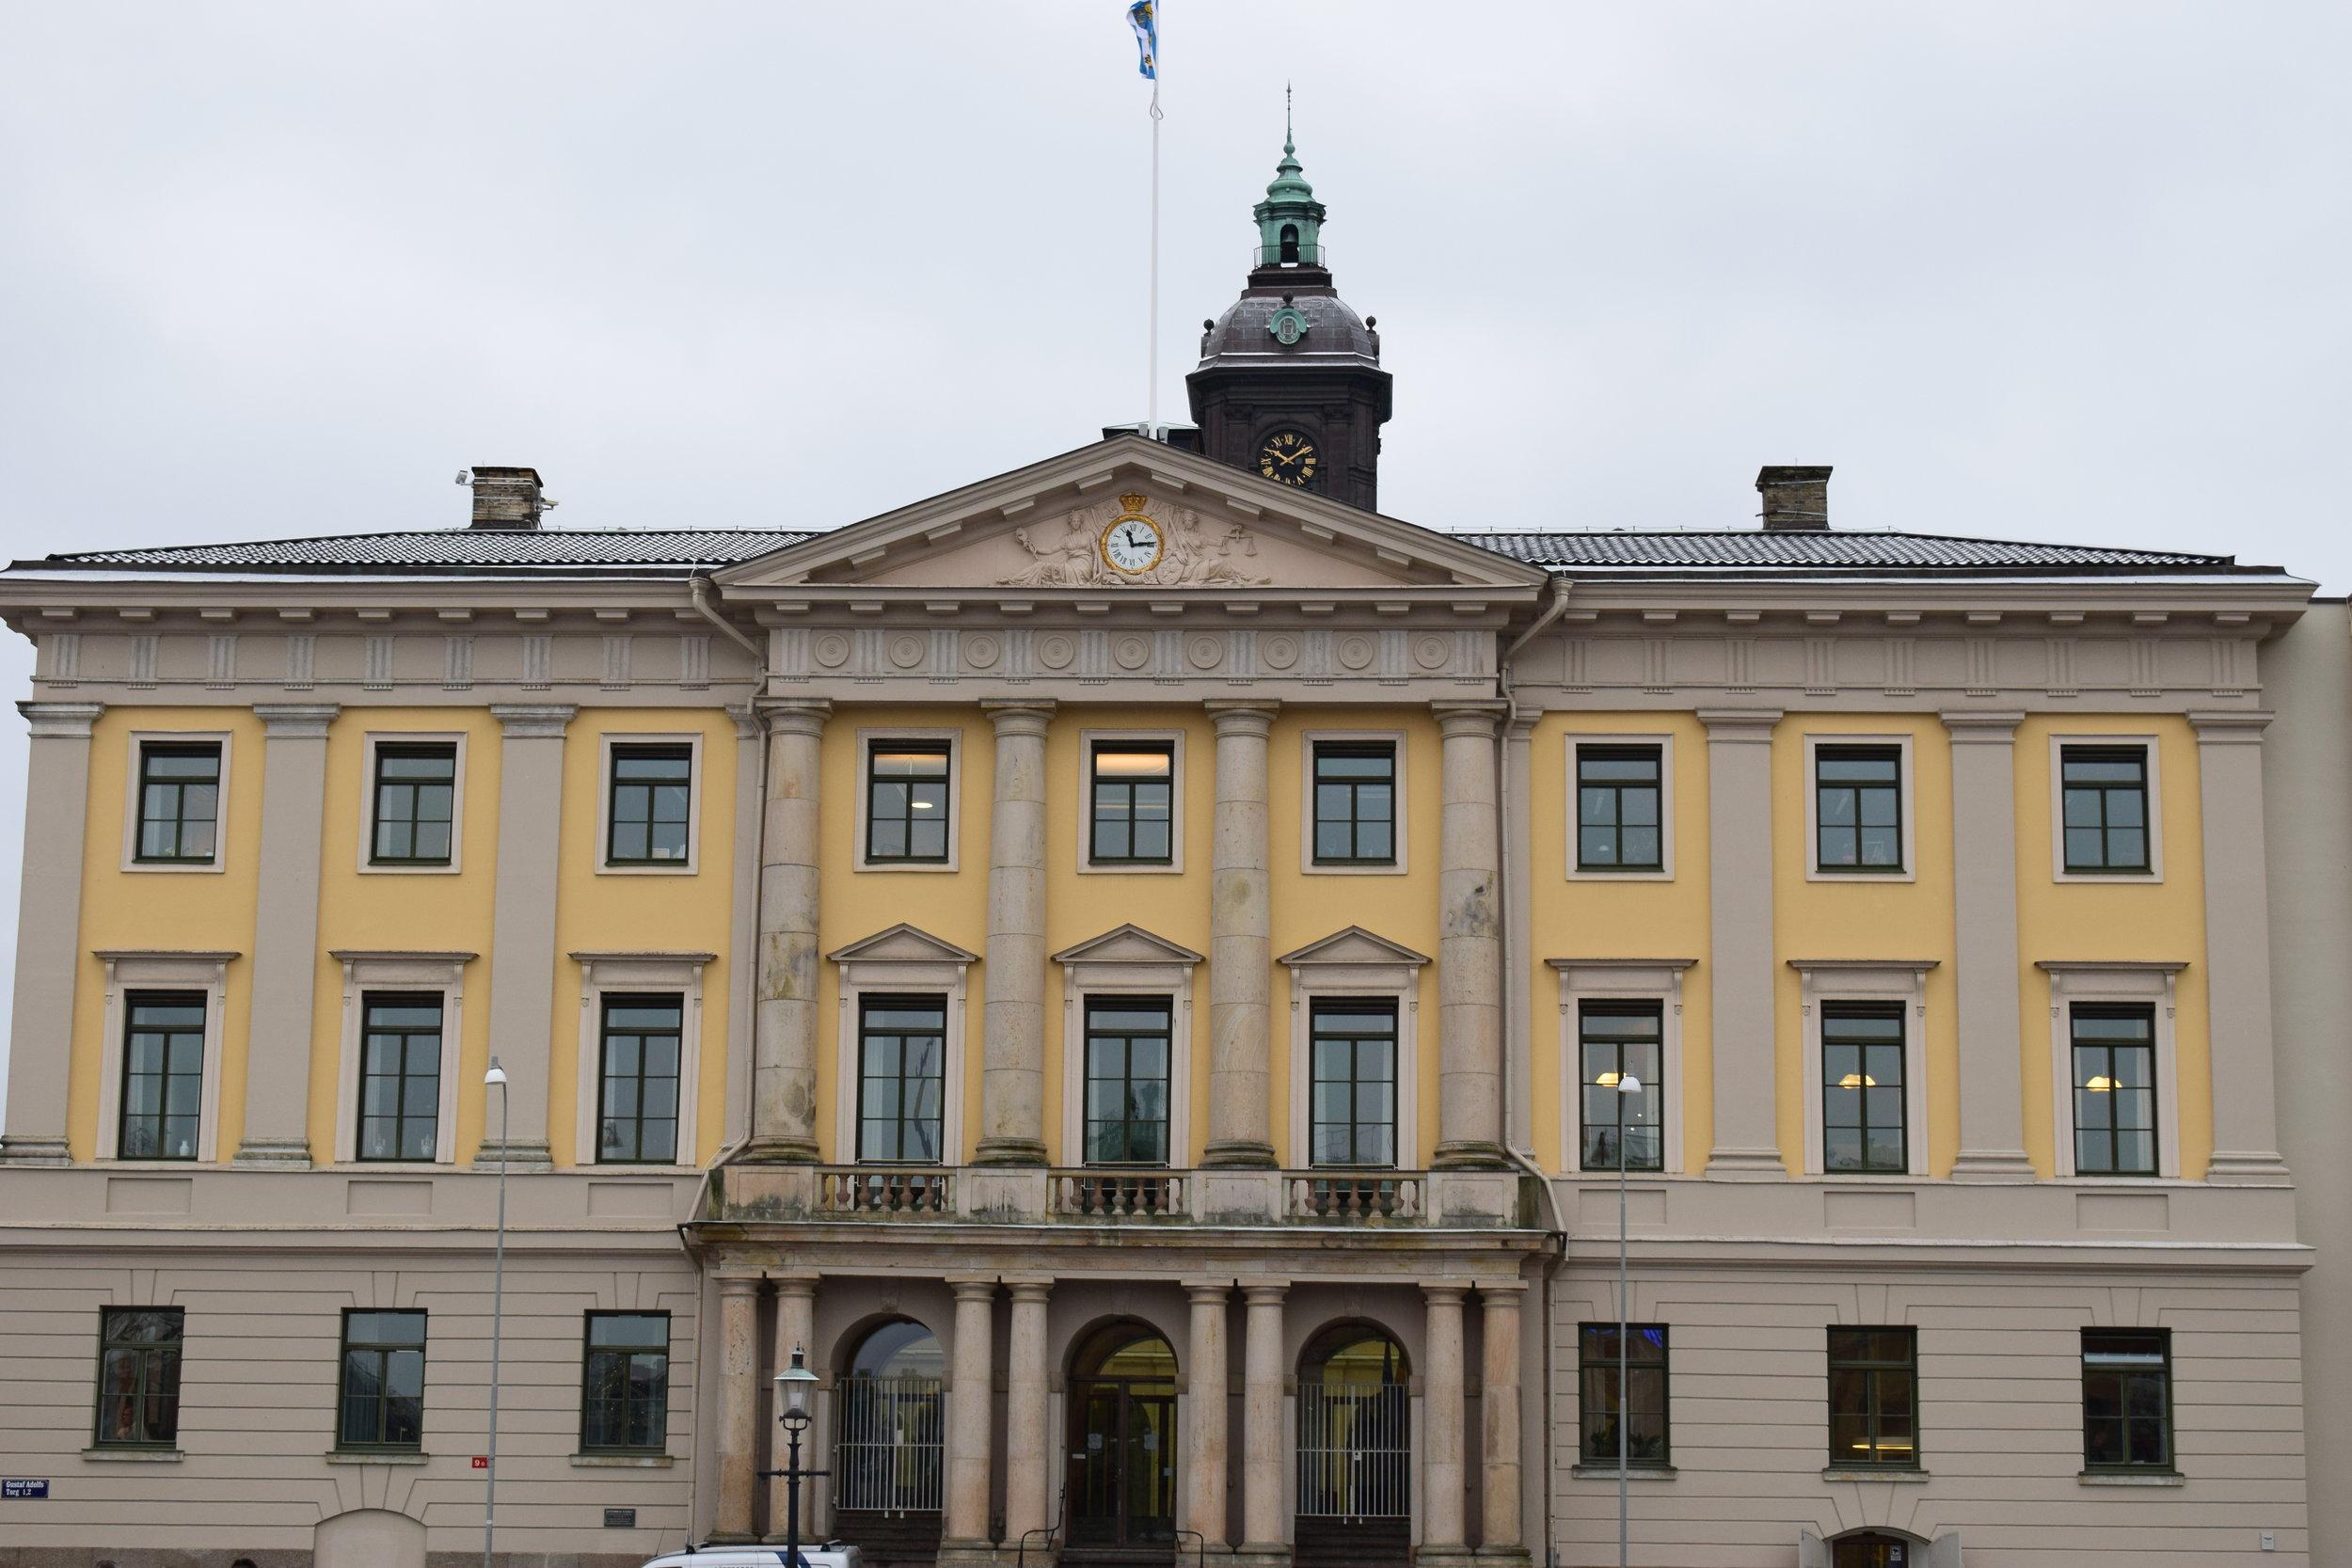 Nicodemus Tessin den äldre, Göteborgs rådhuset (City Hall in Gotheburg), 1672, Göteborg